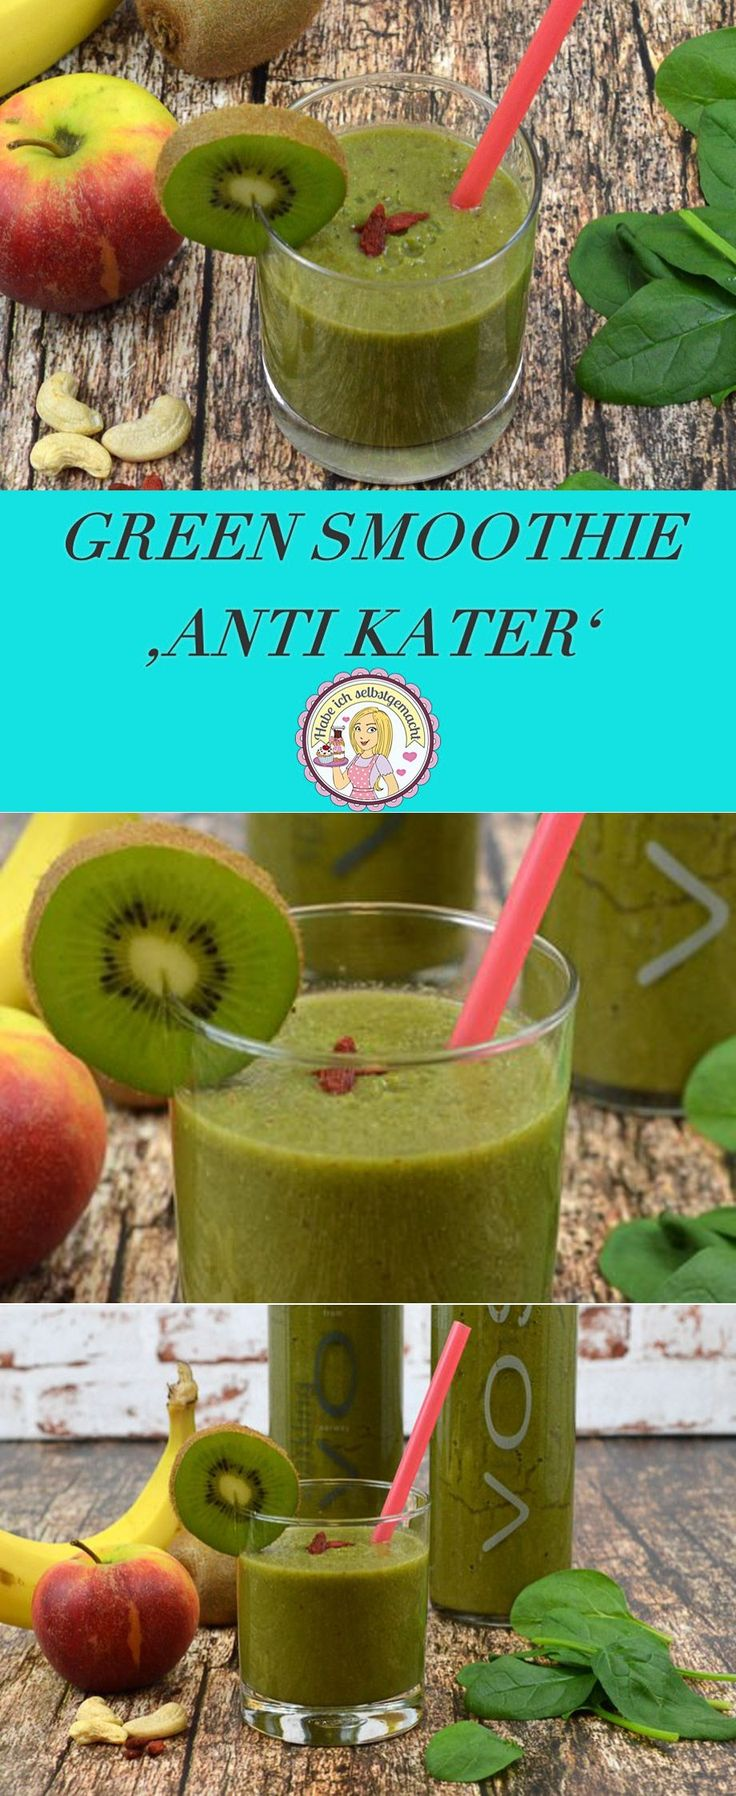 Green Smoothie Anti Kater, gesund, Rezept, lecker, Ernährung